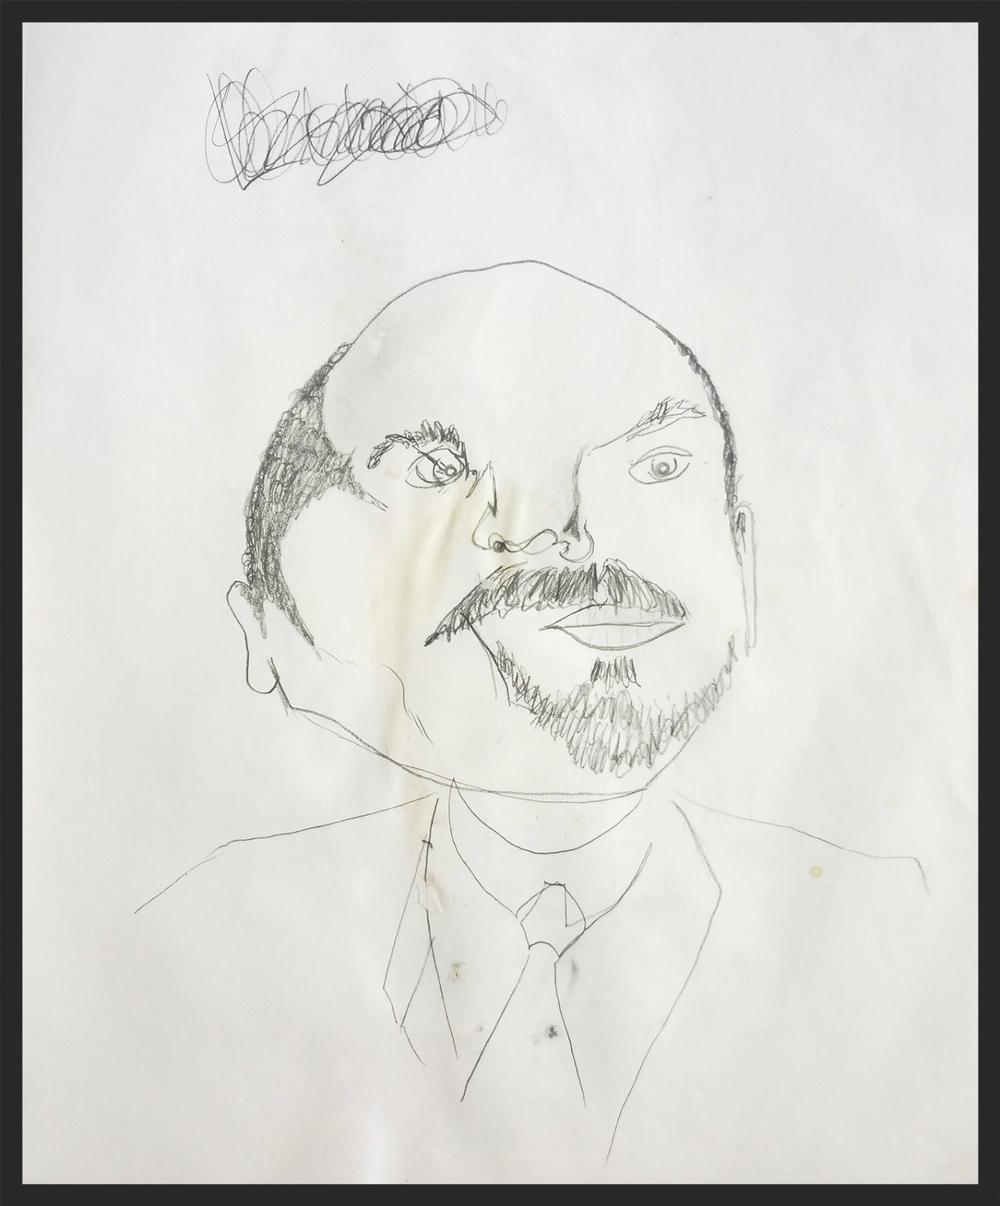 Lenin no Look - 2012